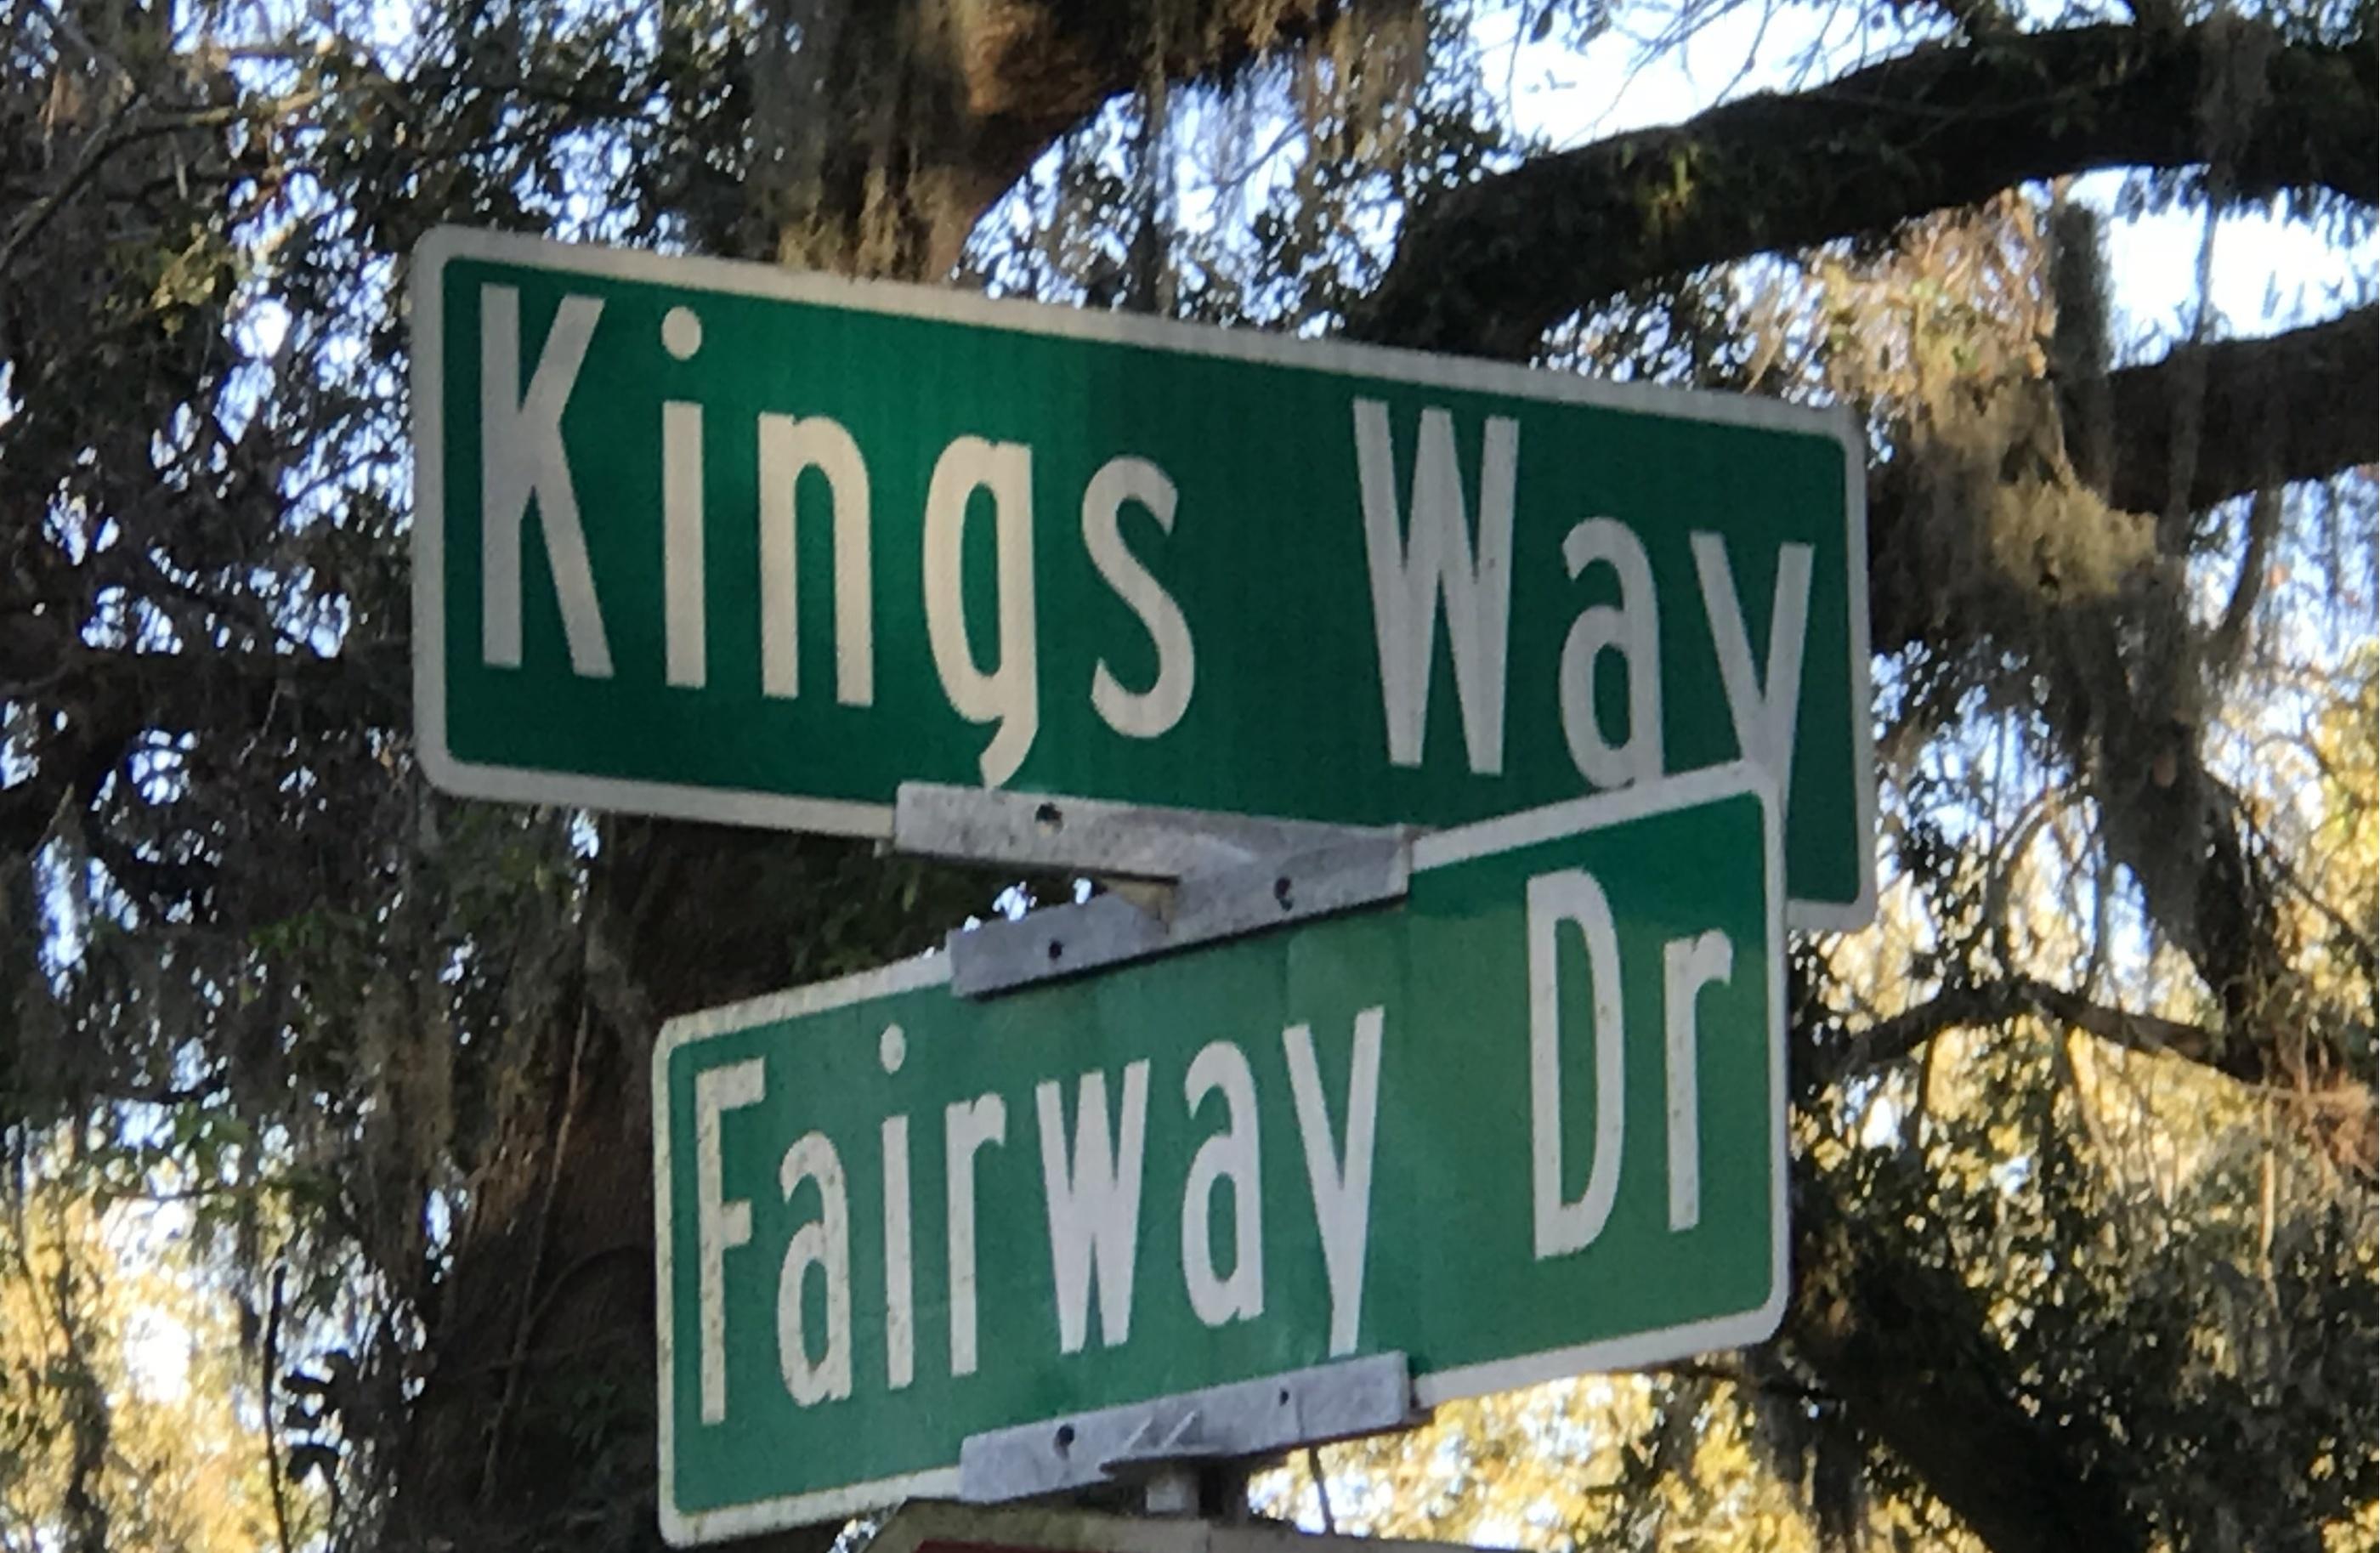 Kingswaysign